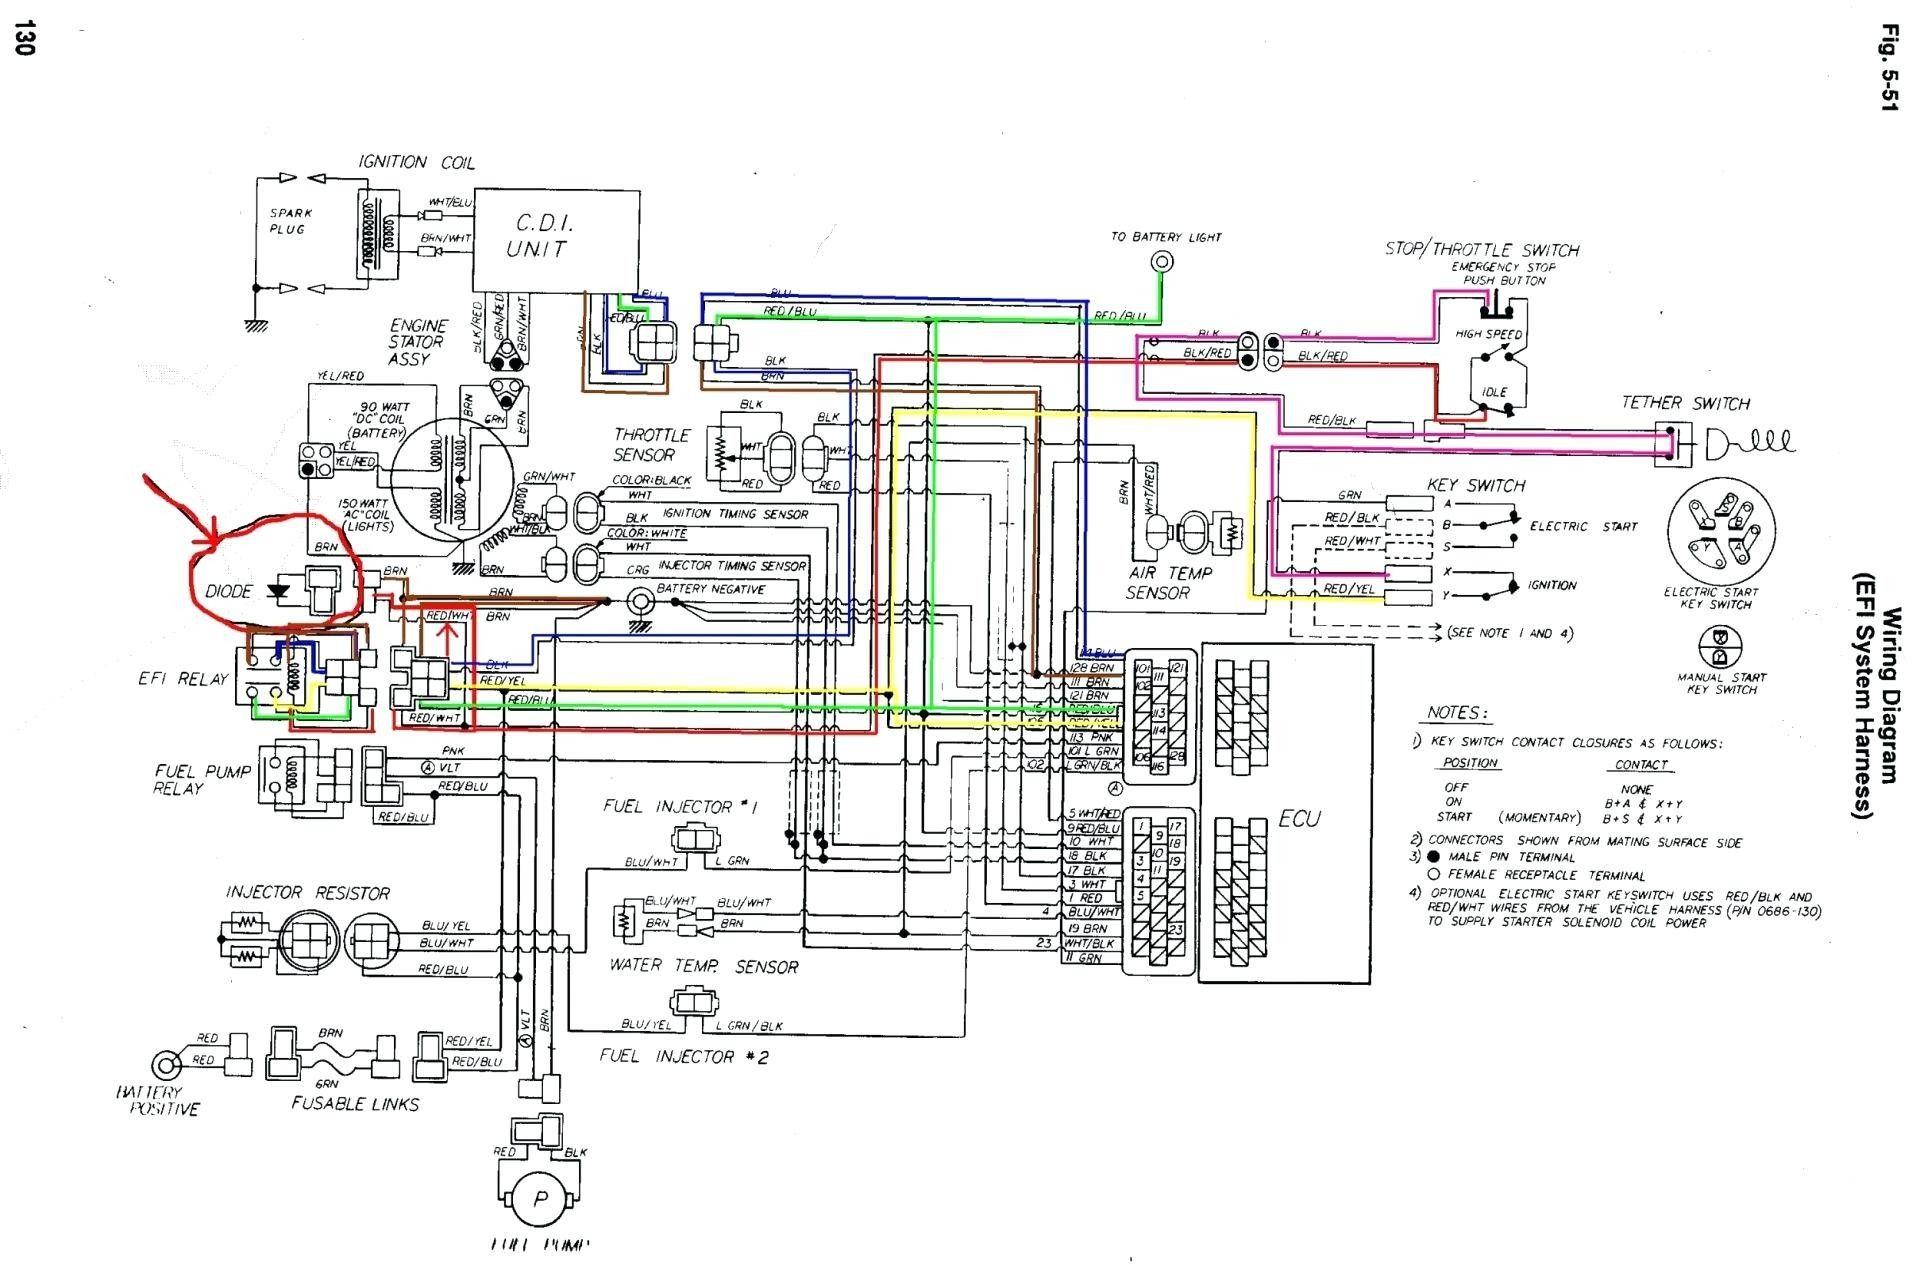 Wiring Diagram Ac Mobil Avanza Diagram Diagramtemplate Diagramsample Check More At Https Servisi Co Wiring Diagr Diagram Ceiling Fan Wiring Ceiling Lights